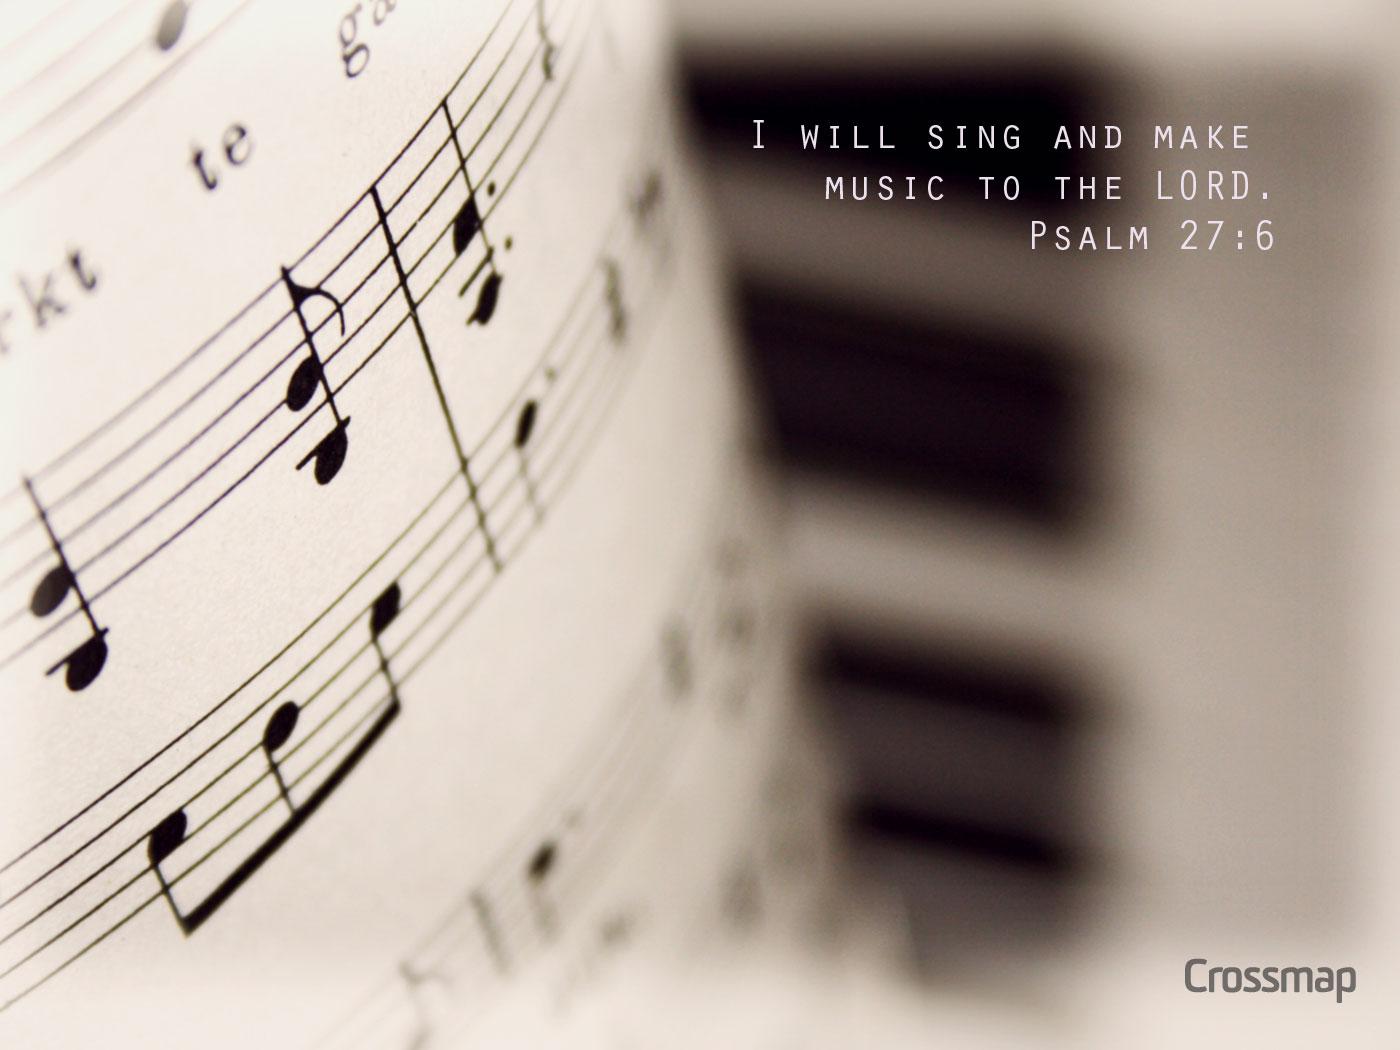 gospel music wallpaper 1280x800 - photo #5